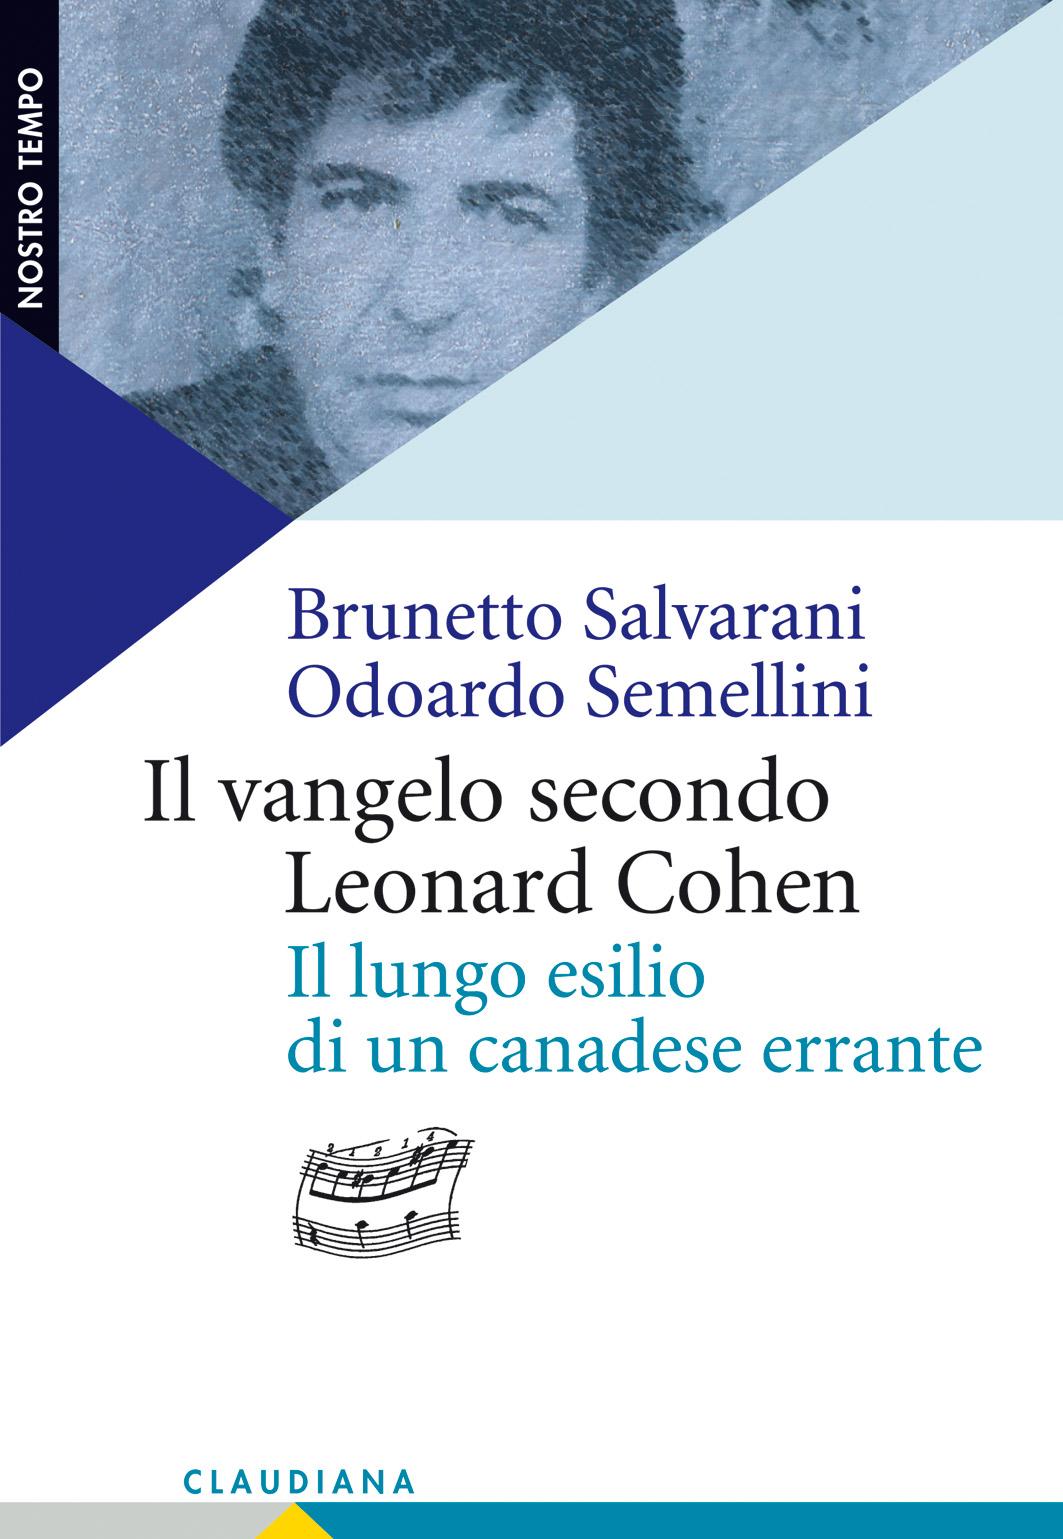 Il Vangelo secondo Leonard Cohen.